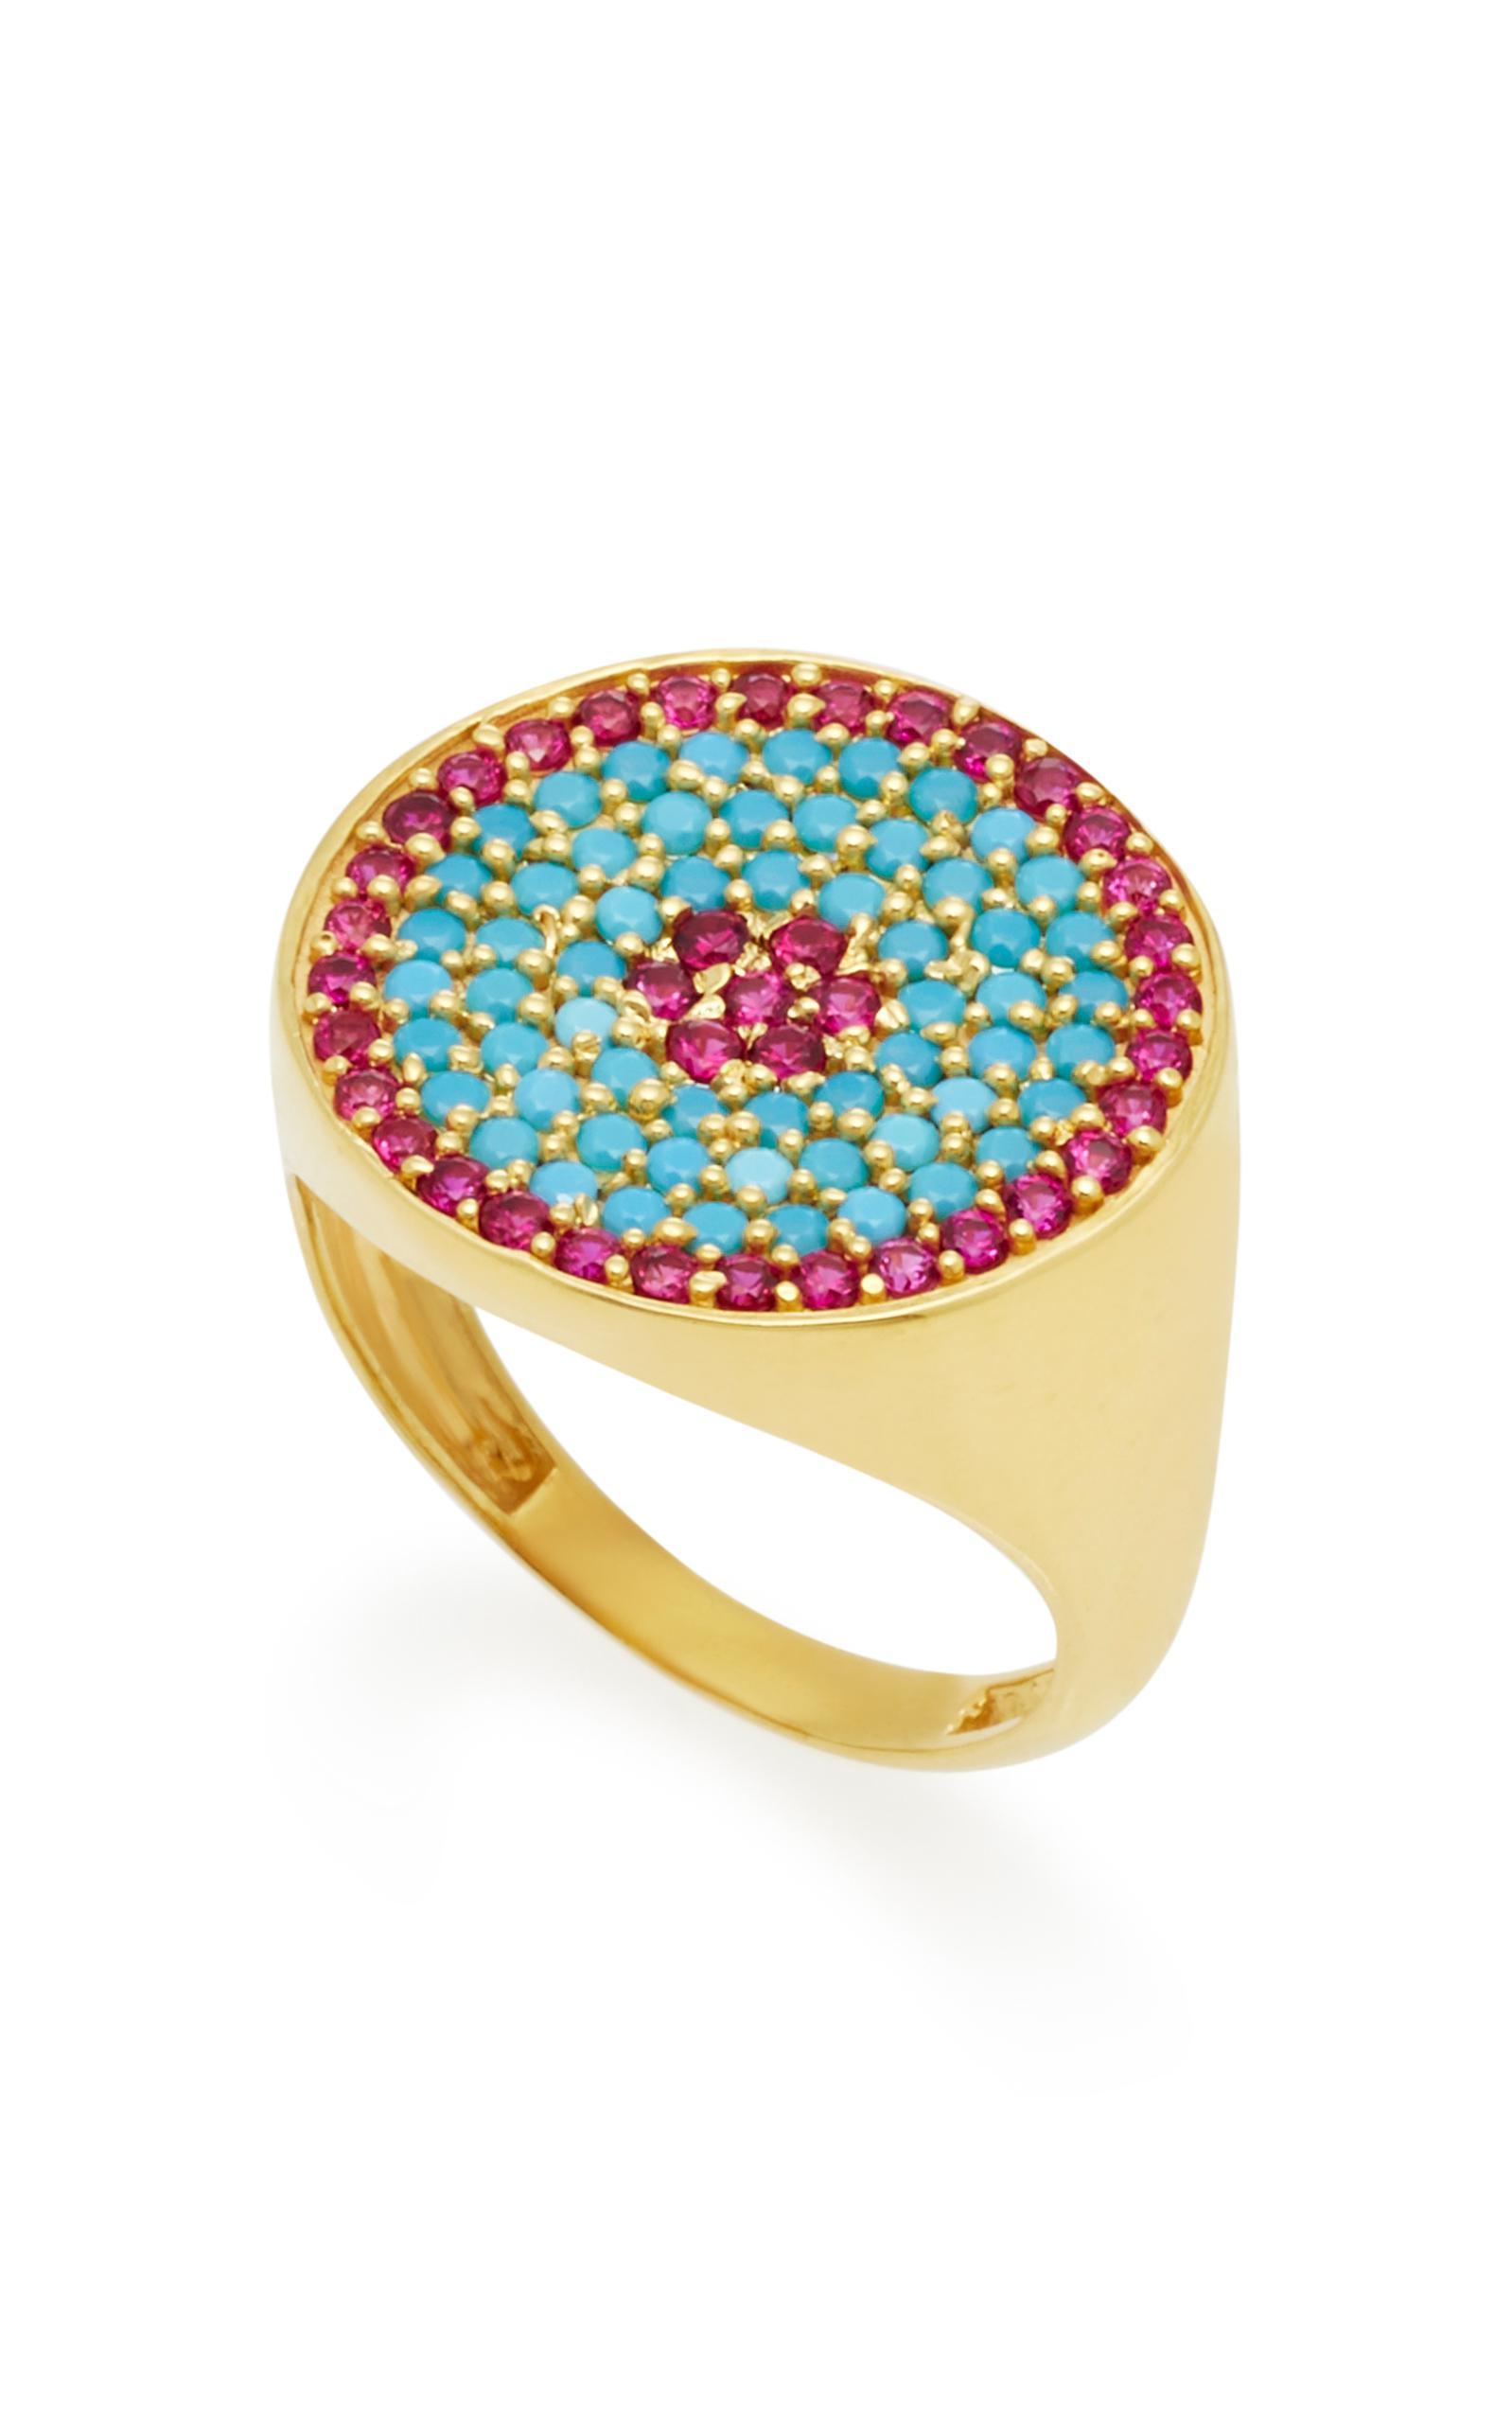 Joanna Laura Constantine Gold-Plated Ruby Crisscross Ring fe0DIpTTBz